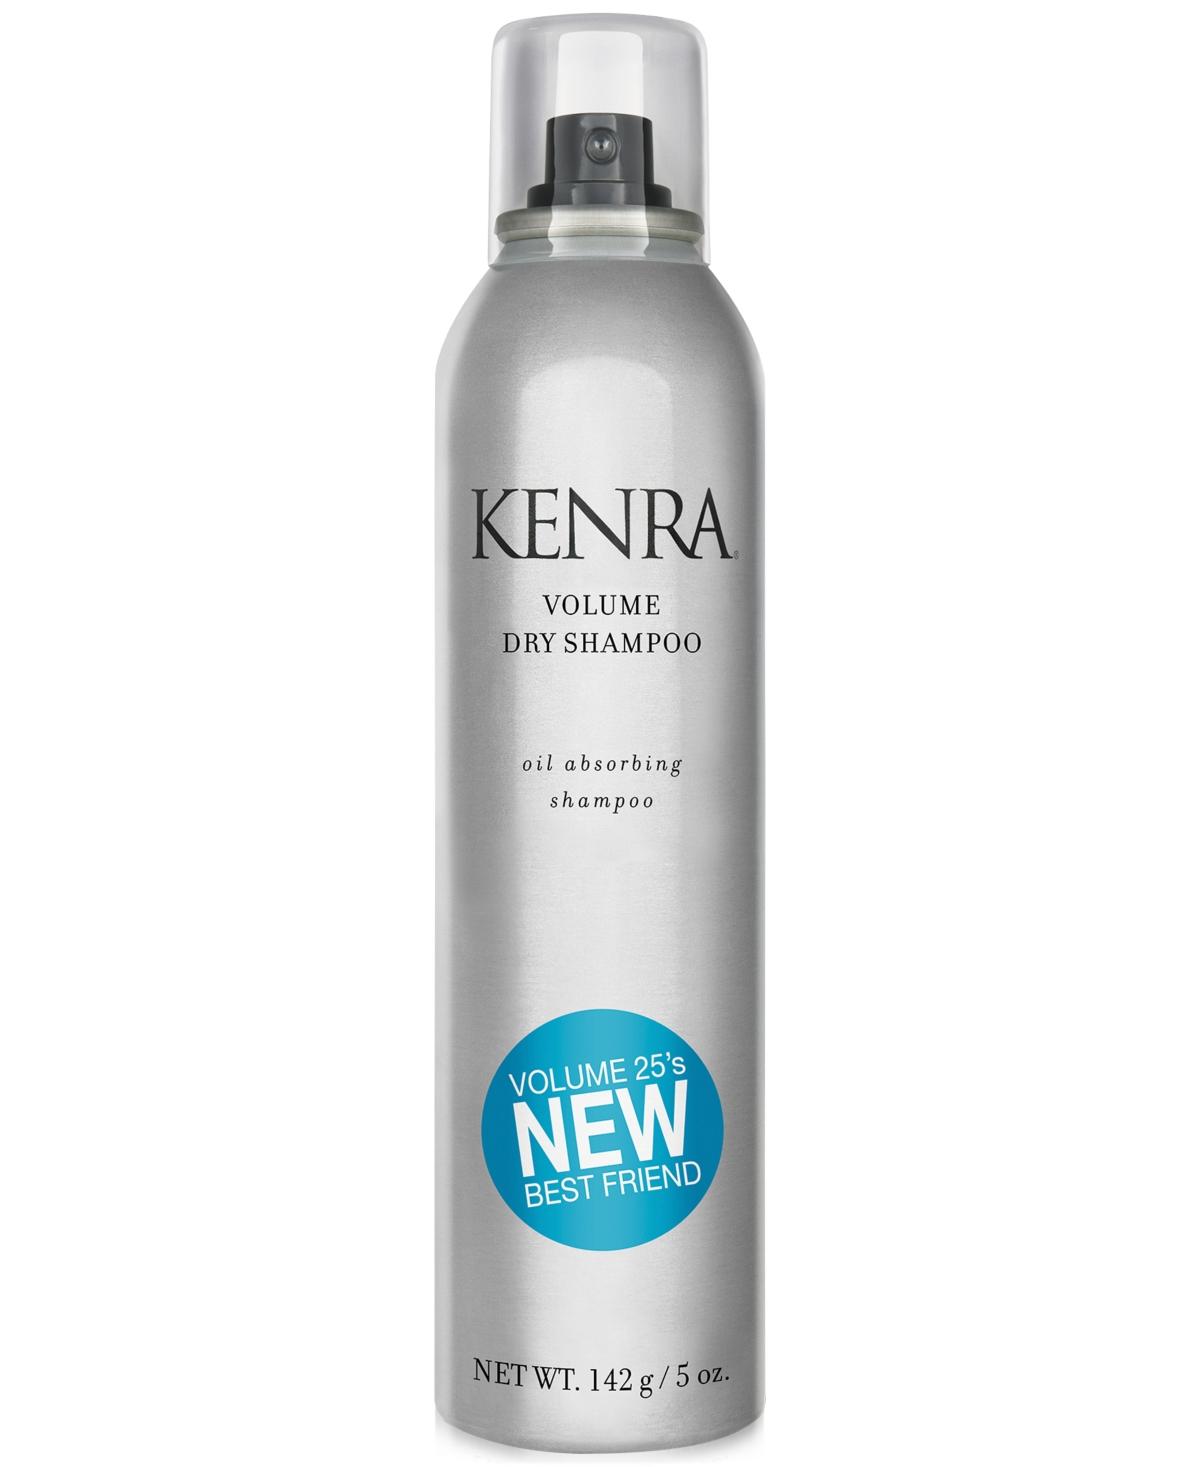 Kenra Professional Dry Shampoo, 5-oz, from Purebeauty Salon & Spa